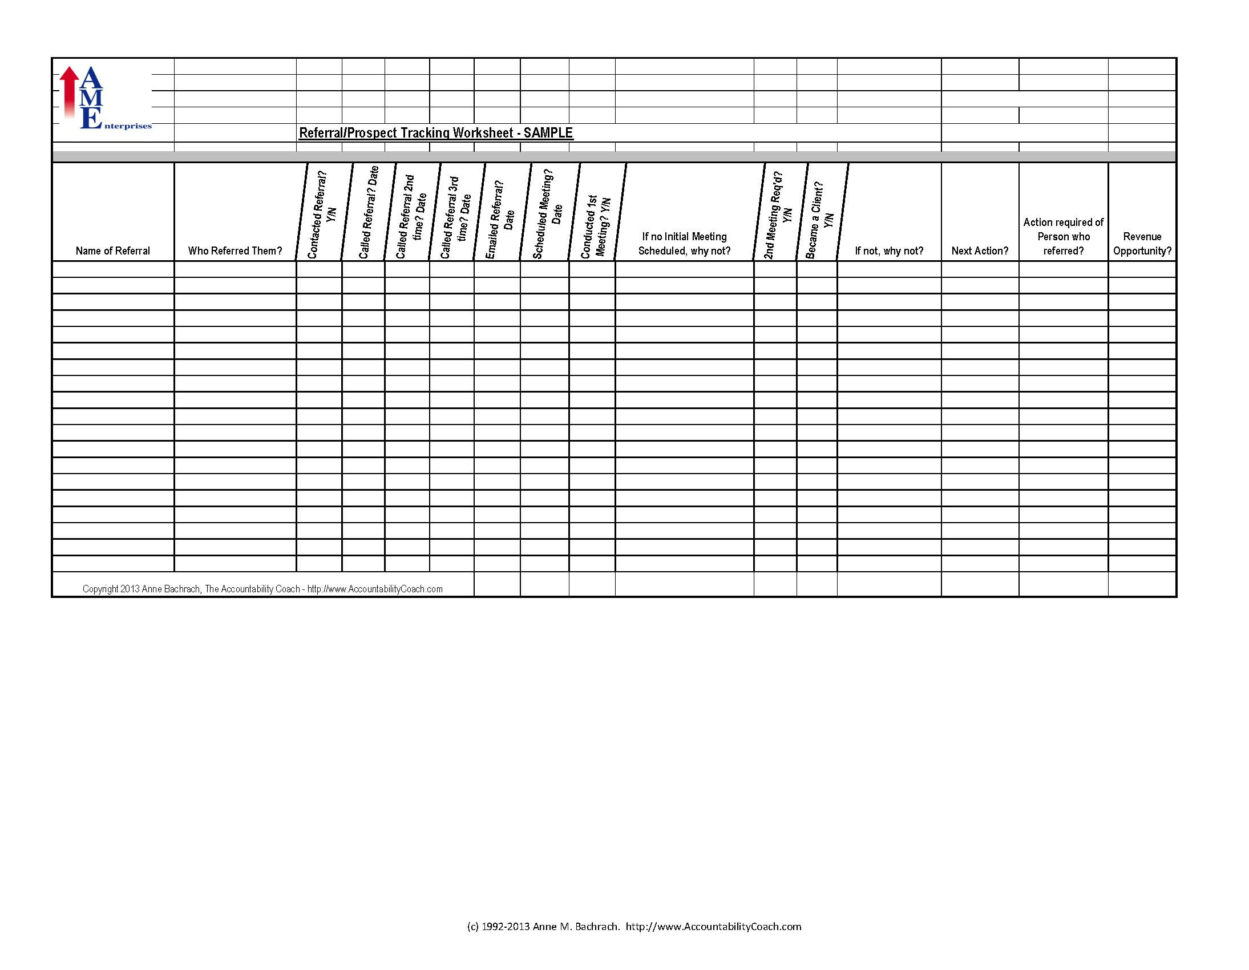 Spreadsheet Template Page 281 Melbourne Cup Calcutta